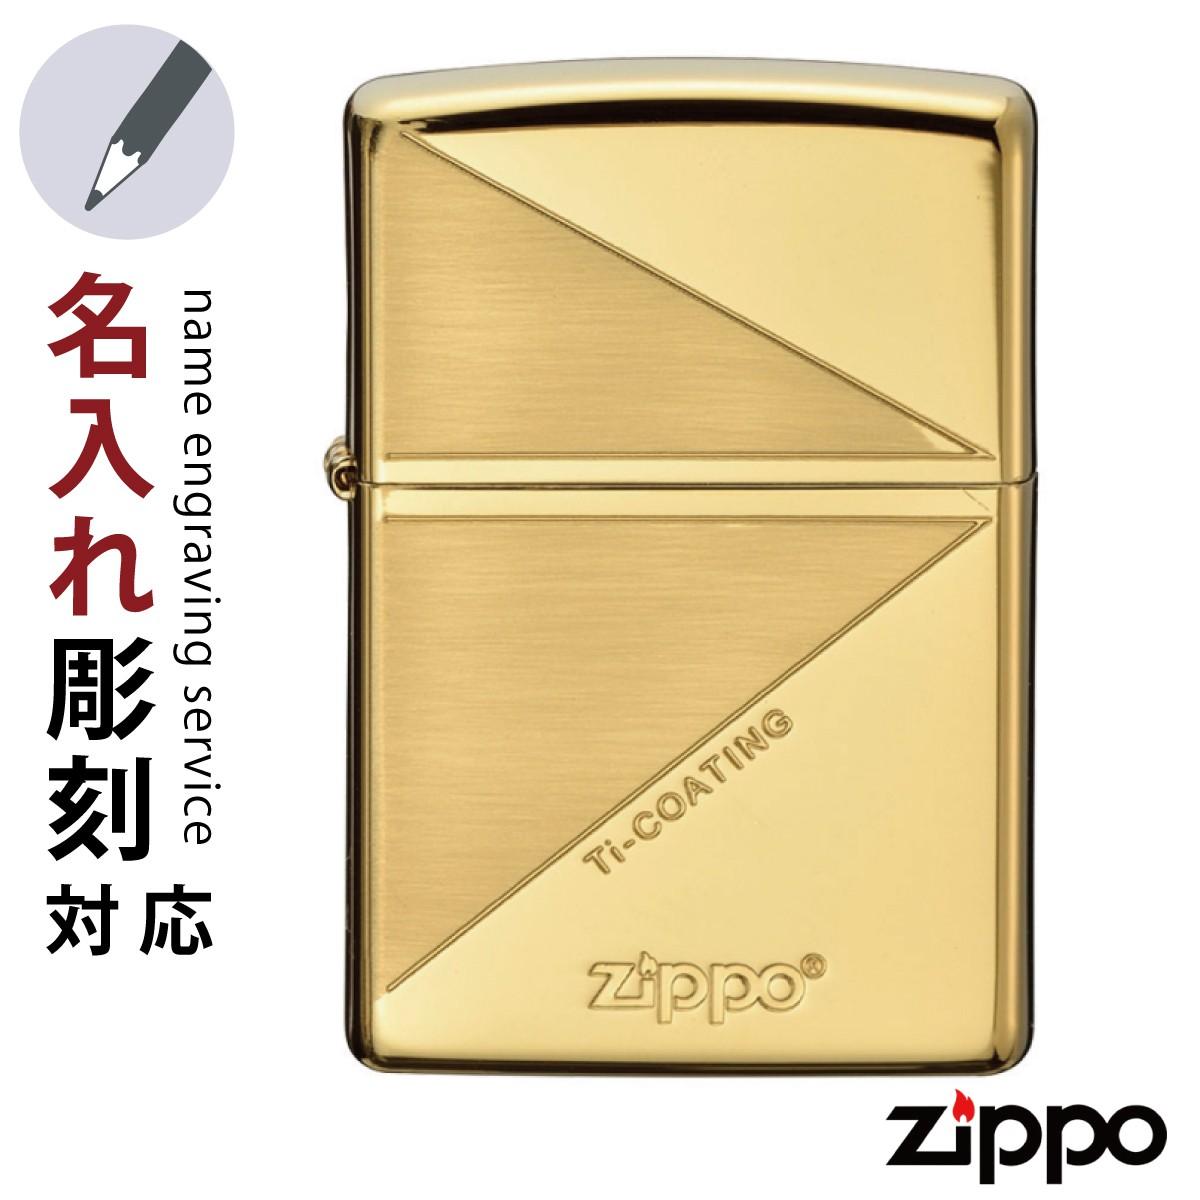 zippo ジッポー ライター Zippoライター ジッポライター 金チタンZ #3 名入れ ギフト